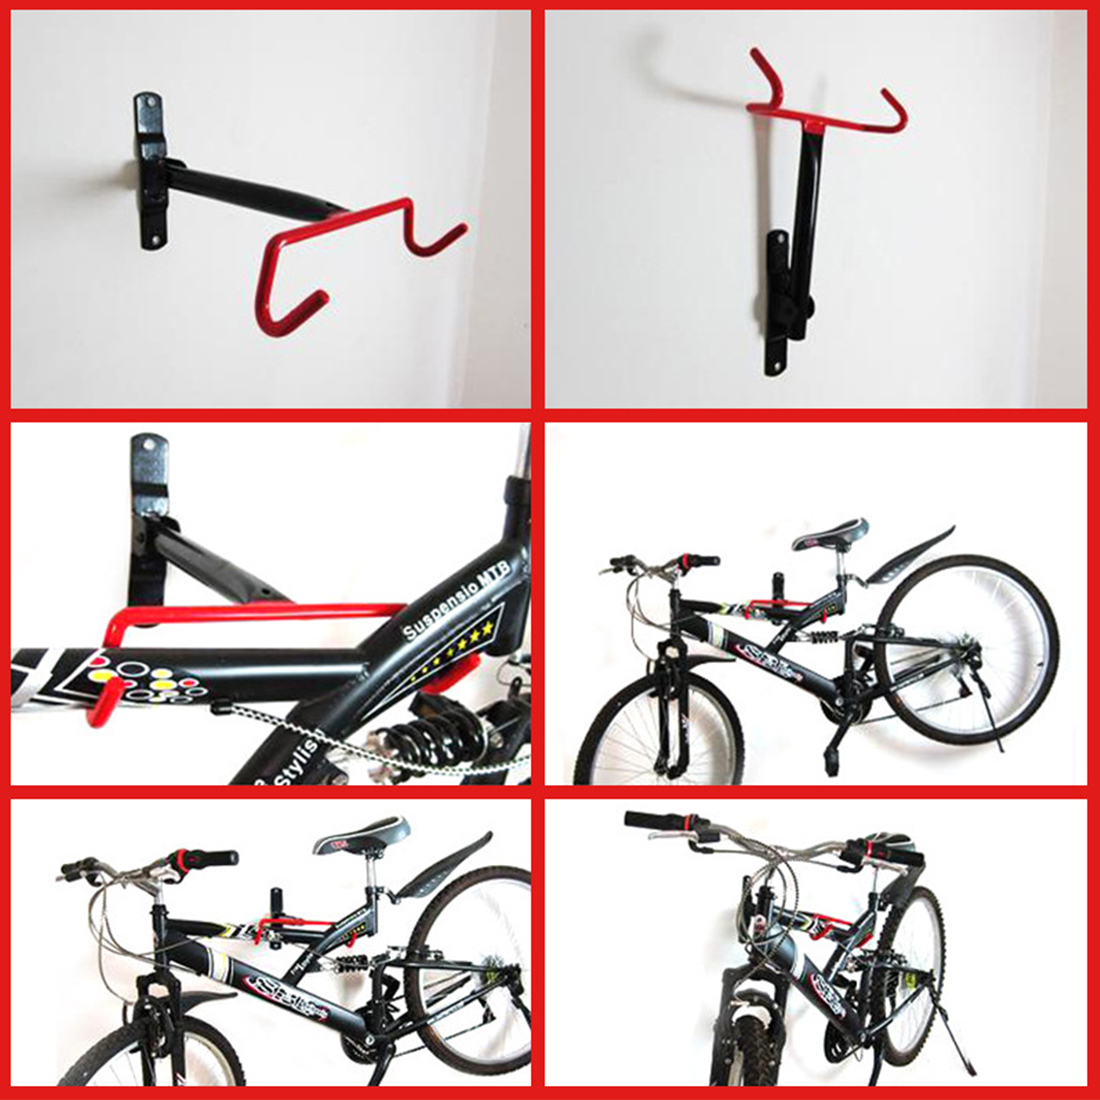 Bicycle Tough Steel Storage Parking Rack Bike Holder Mount Hanger Hook Garage Wall Bike Stand Rack Bicycle Hook Holder Racks Red